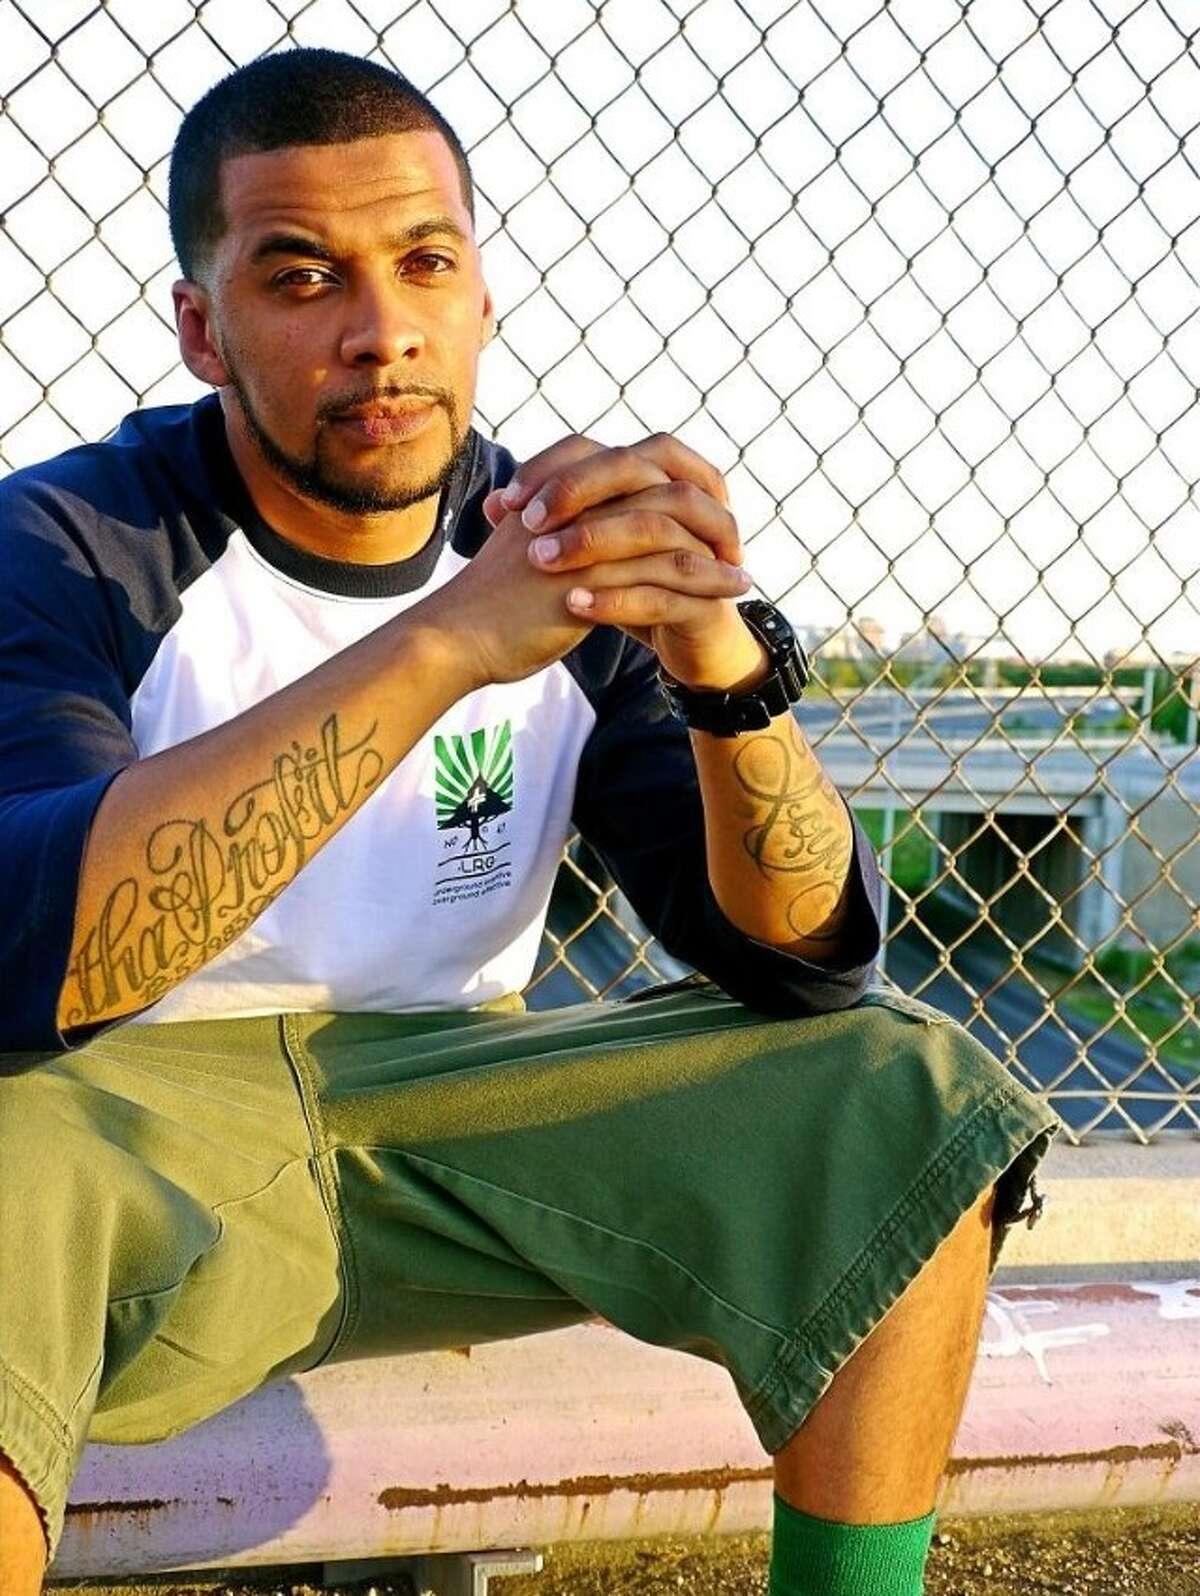 Rapper describes himself as a mellow, laid-back MC8:55 p.m. Tuesday, 512; 10:10 p.m. Saturday, Clive Bar